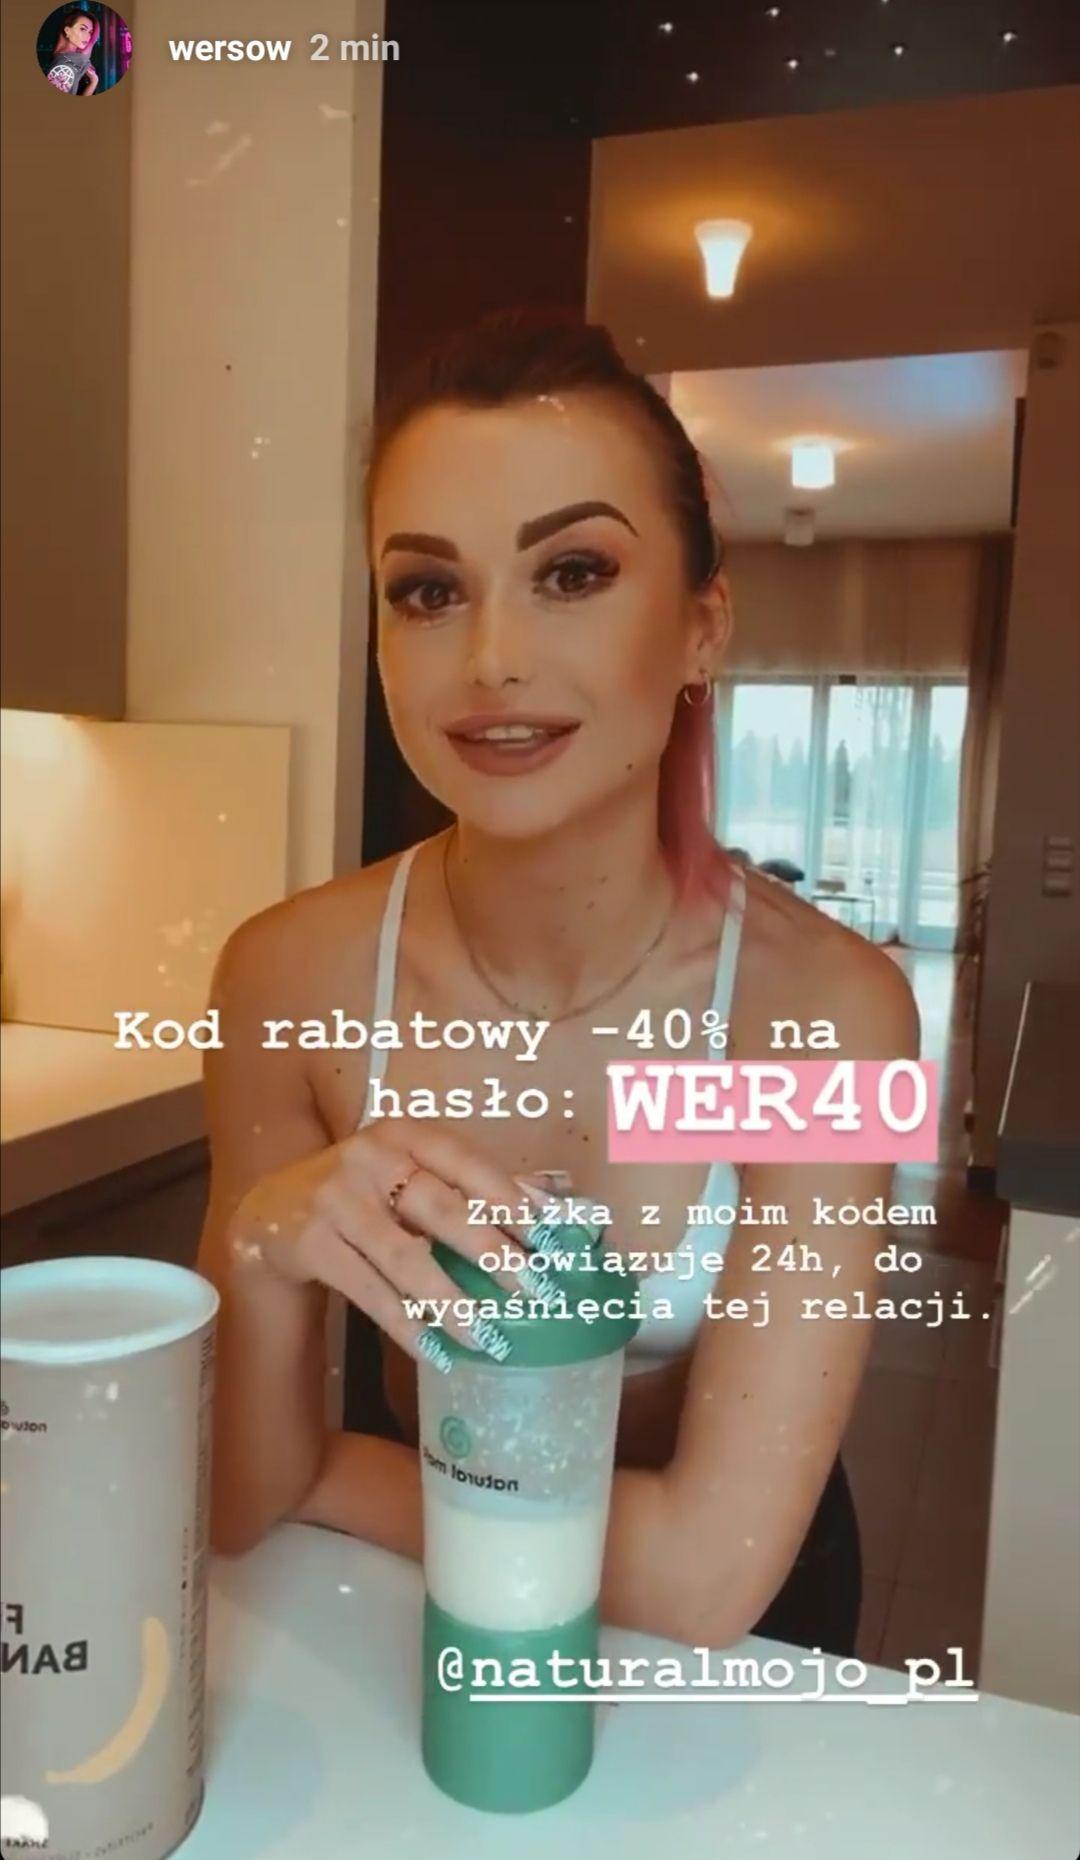 NaturalMojo.pl - Kod Rabatowy -40%.